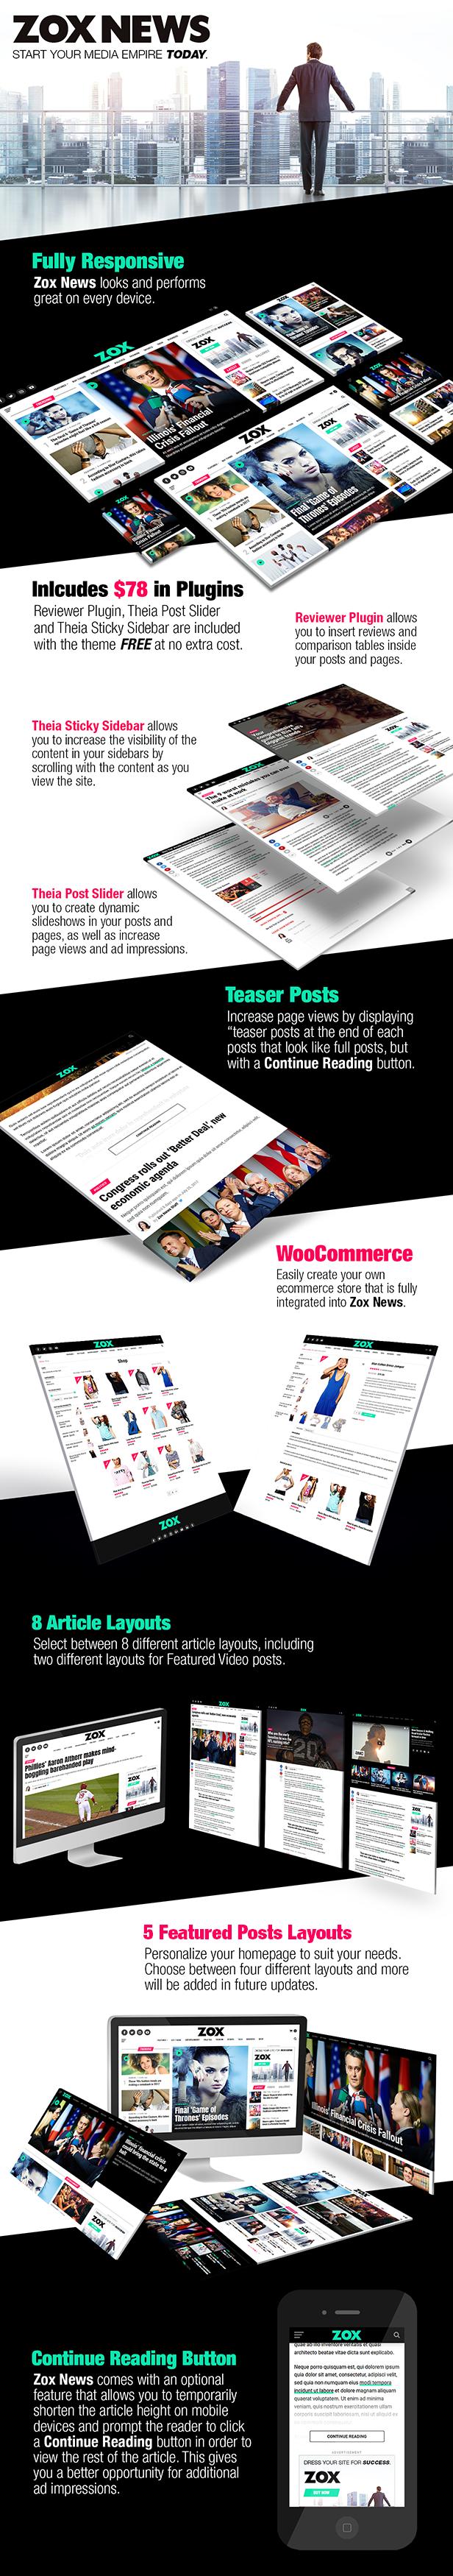 Zox News - Professional WordPress News & Magazine Theme - 2